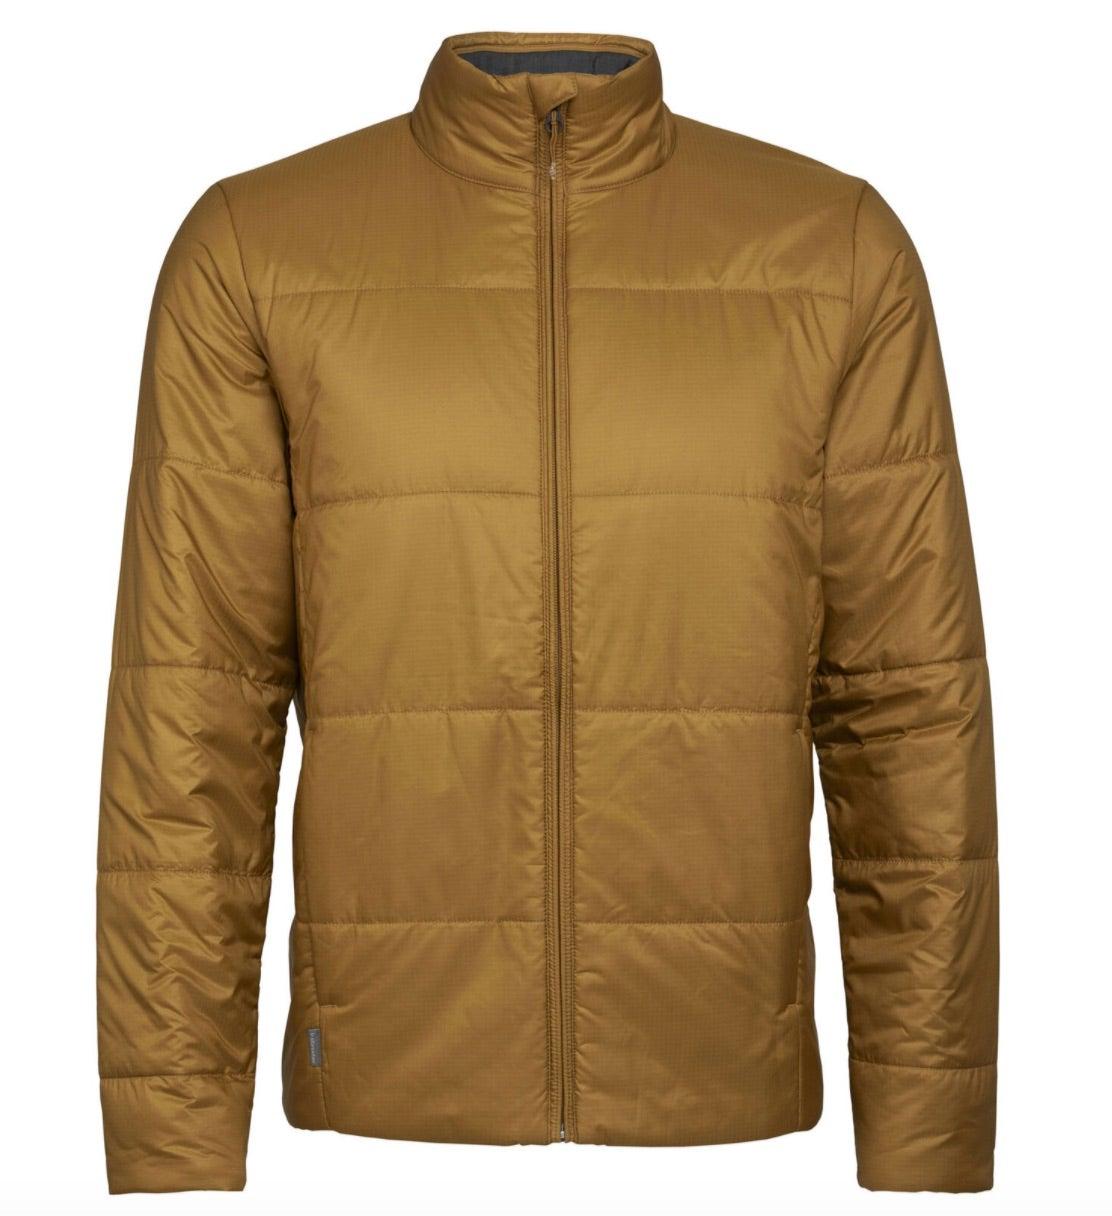 Icebreaker Men's Collingwood Jacket